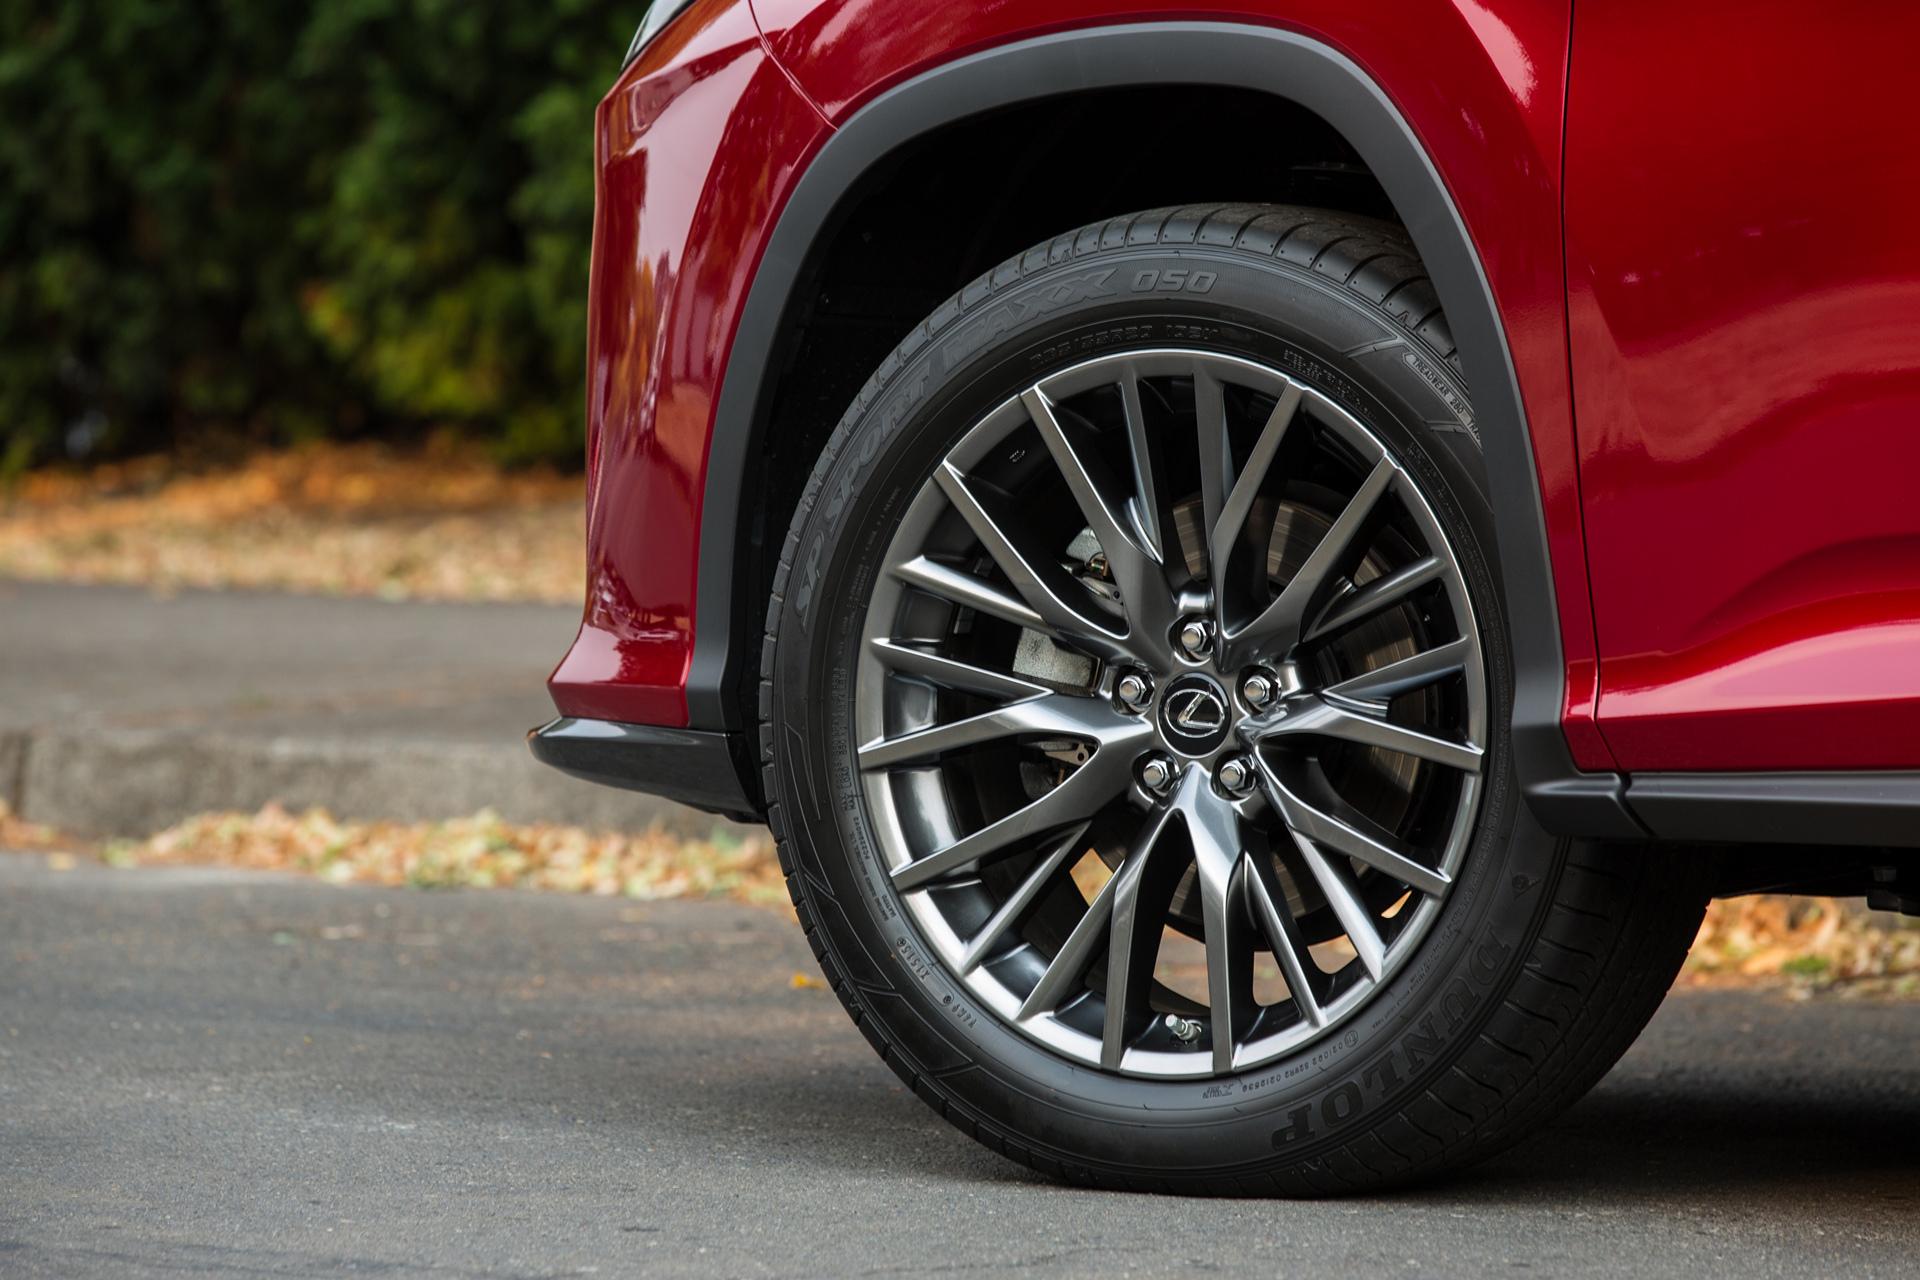 2016 Lexus RX 450h F SPORT © Toyota Motor Corporation